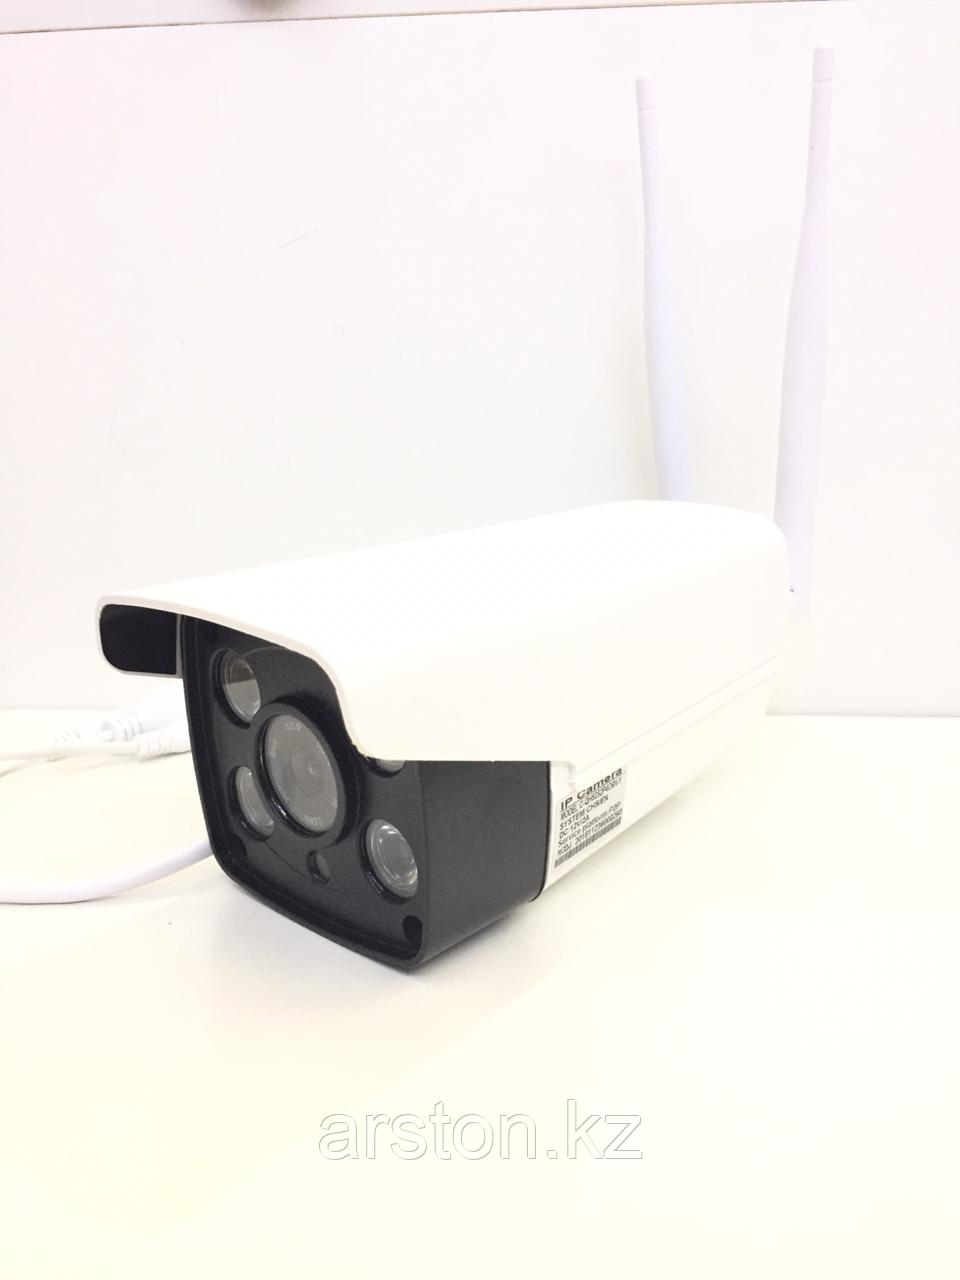 Wi-fi-ip camera yoosee